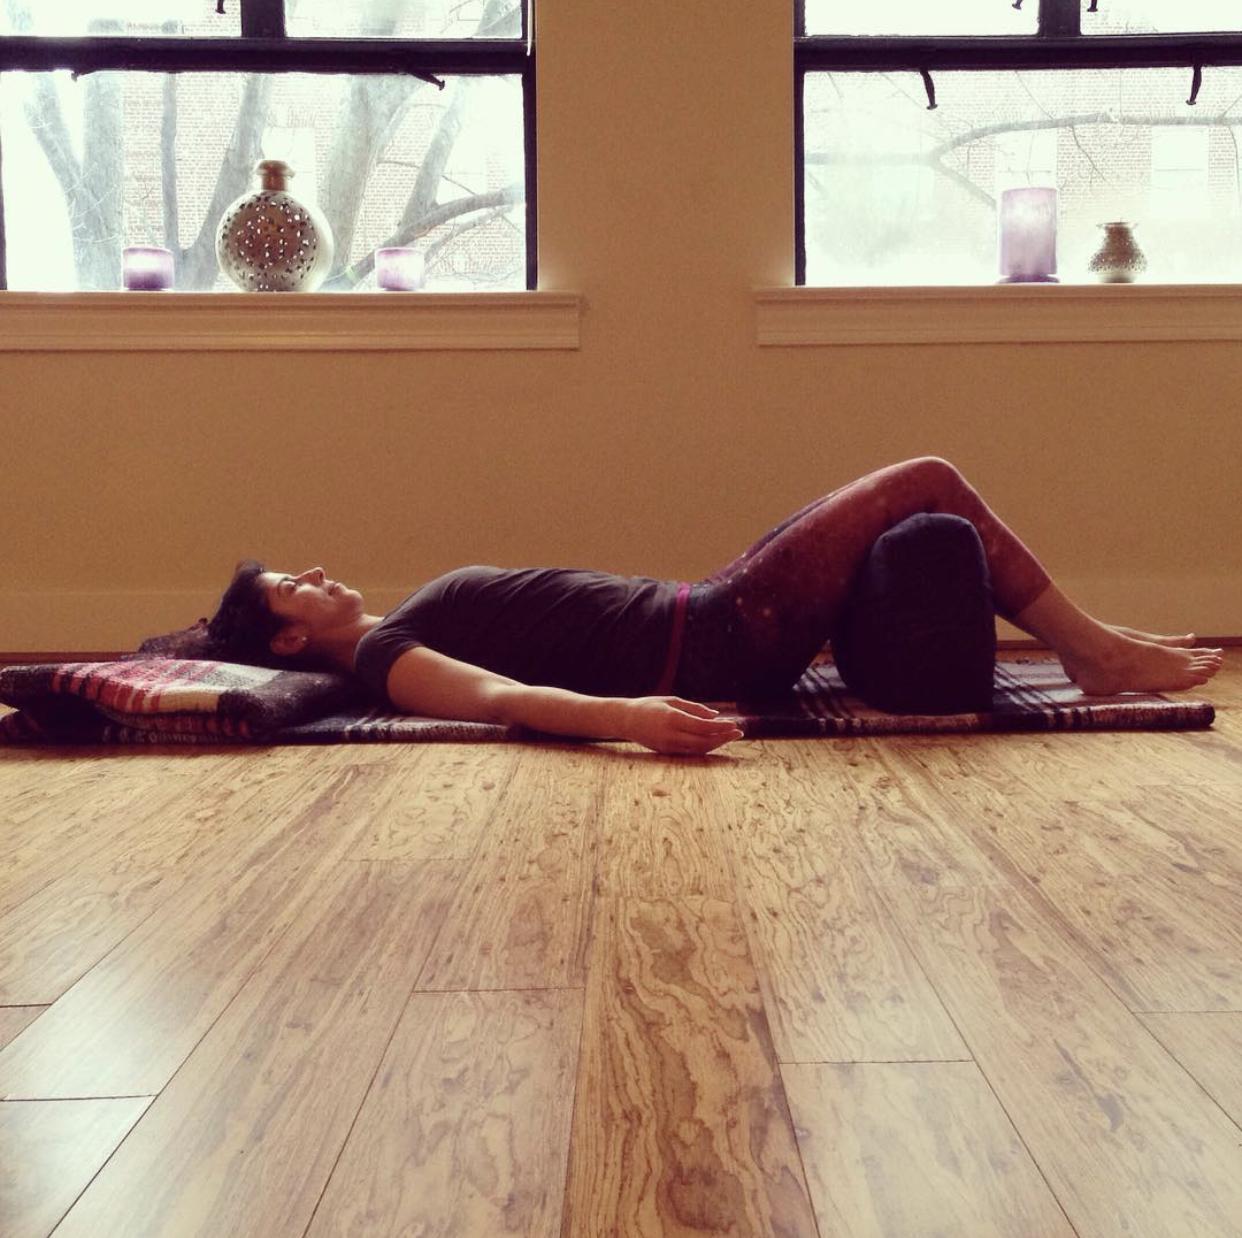 Restorative Yoga Teacher Training June 2021 Online with Yoga and Wellness with Angelina Fox, ERYT500, YACEP, Yoga Teacher and Ayurveda Health Counselor, Maryland, Northern Virginia, Washington DC